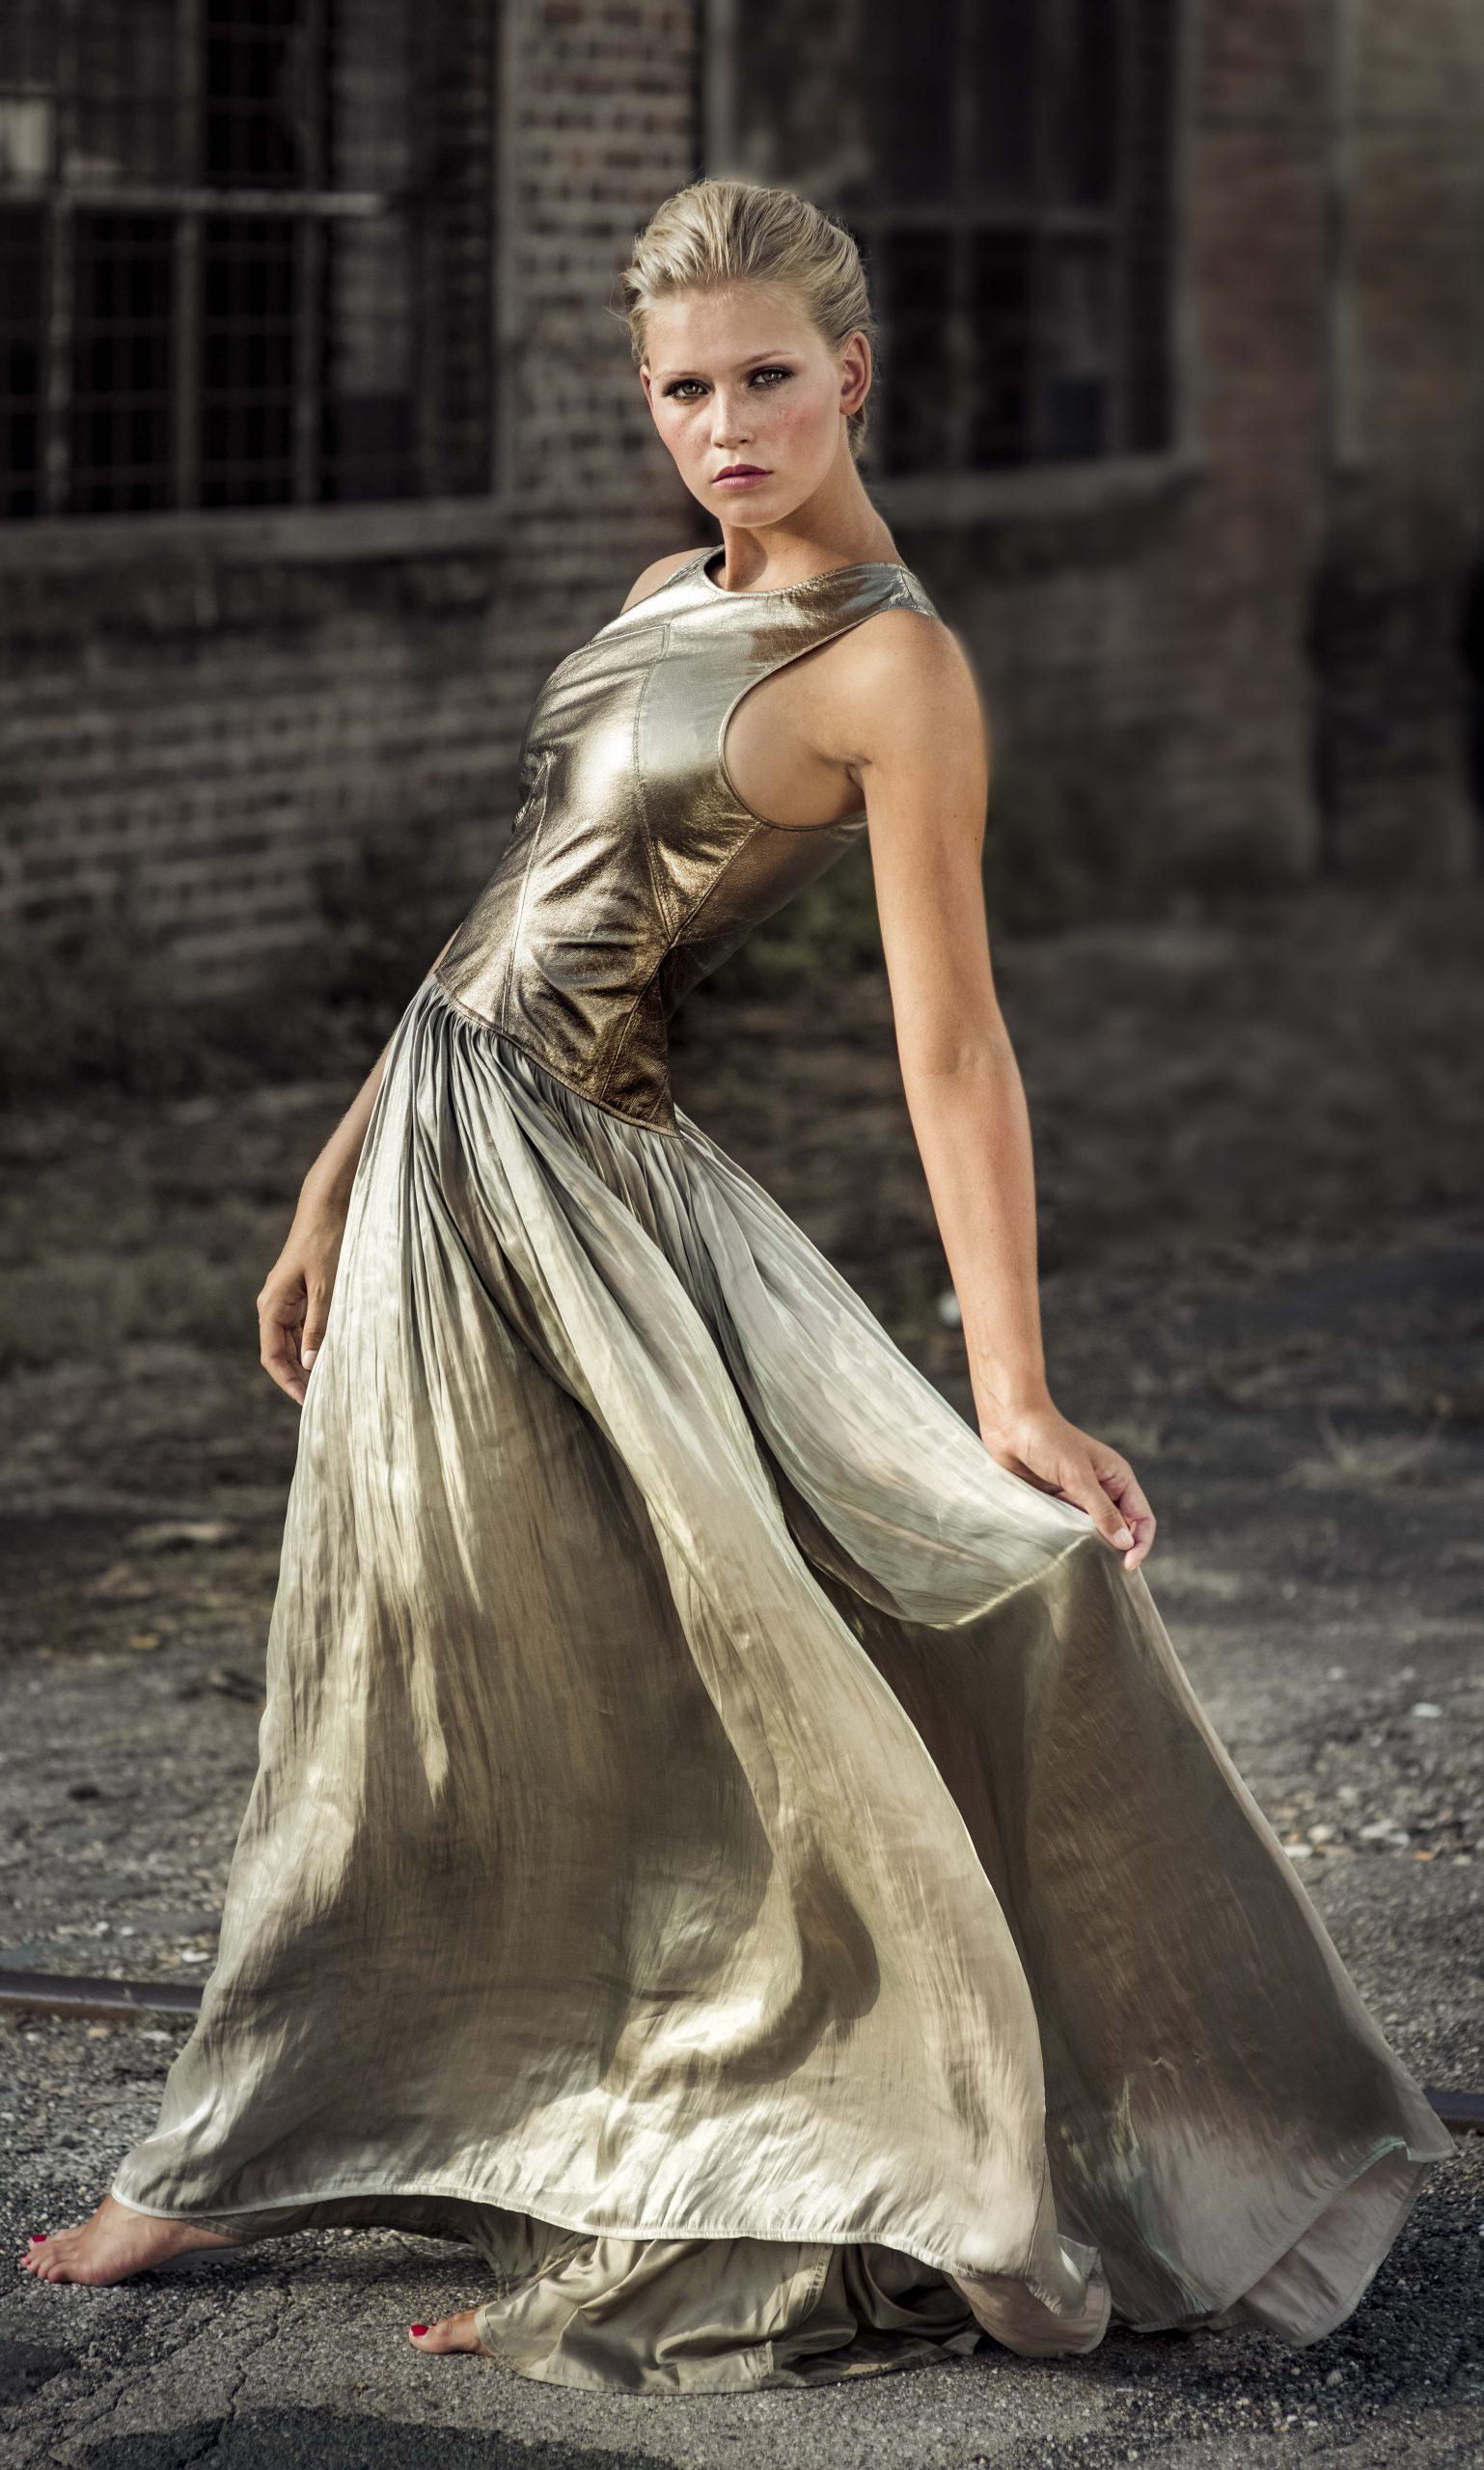 Melanie Kroll by Peter Mueller Photography 22